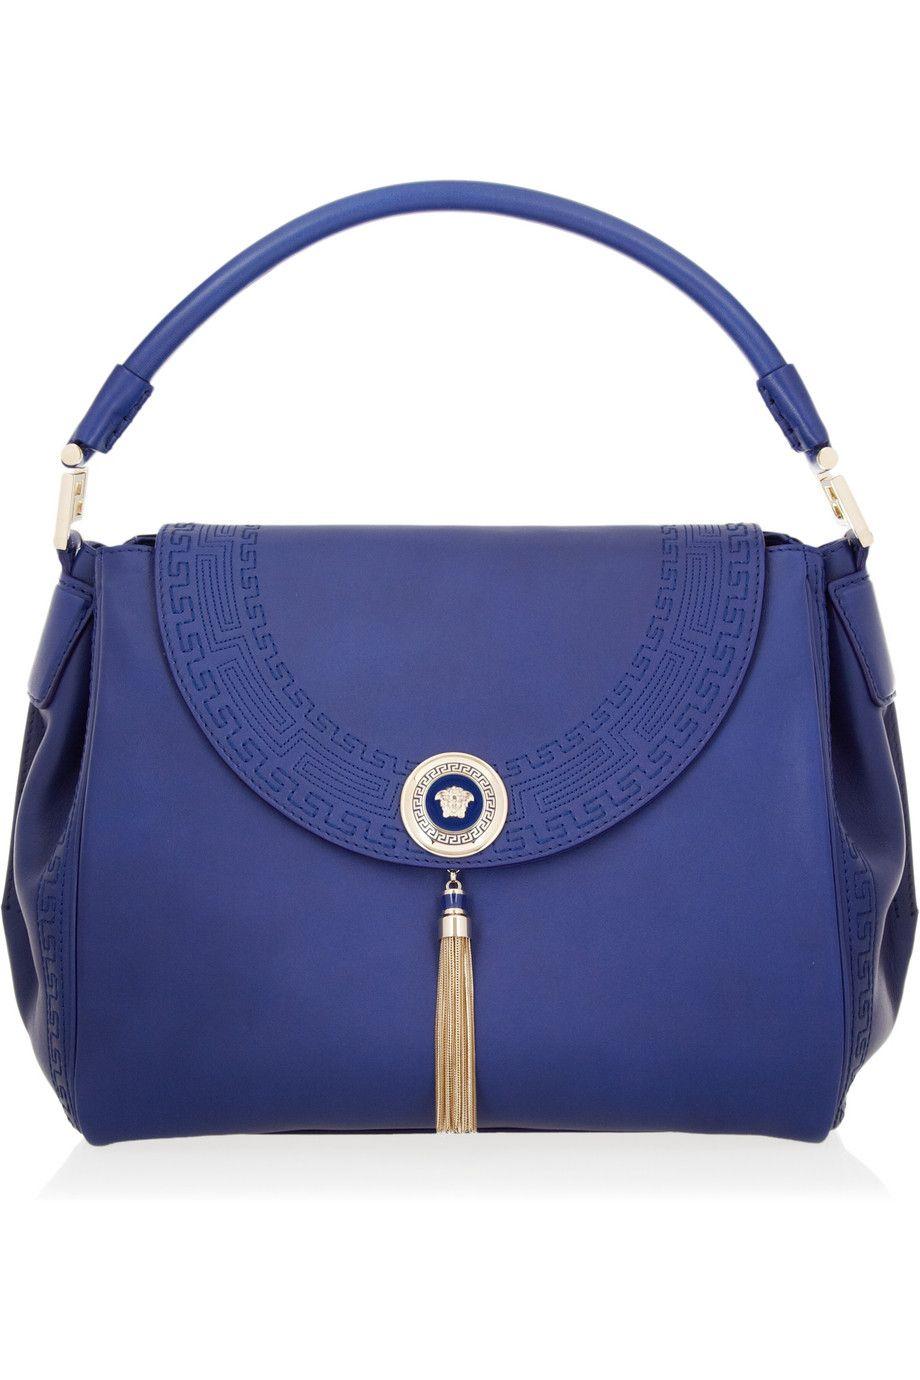 Versace - Leather hobo bag